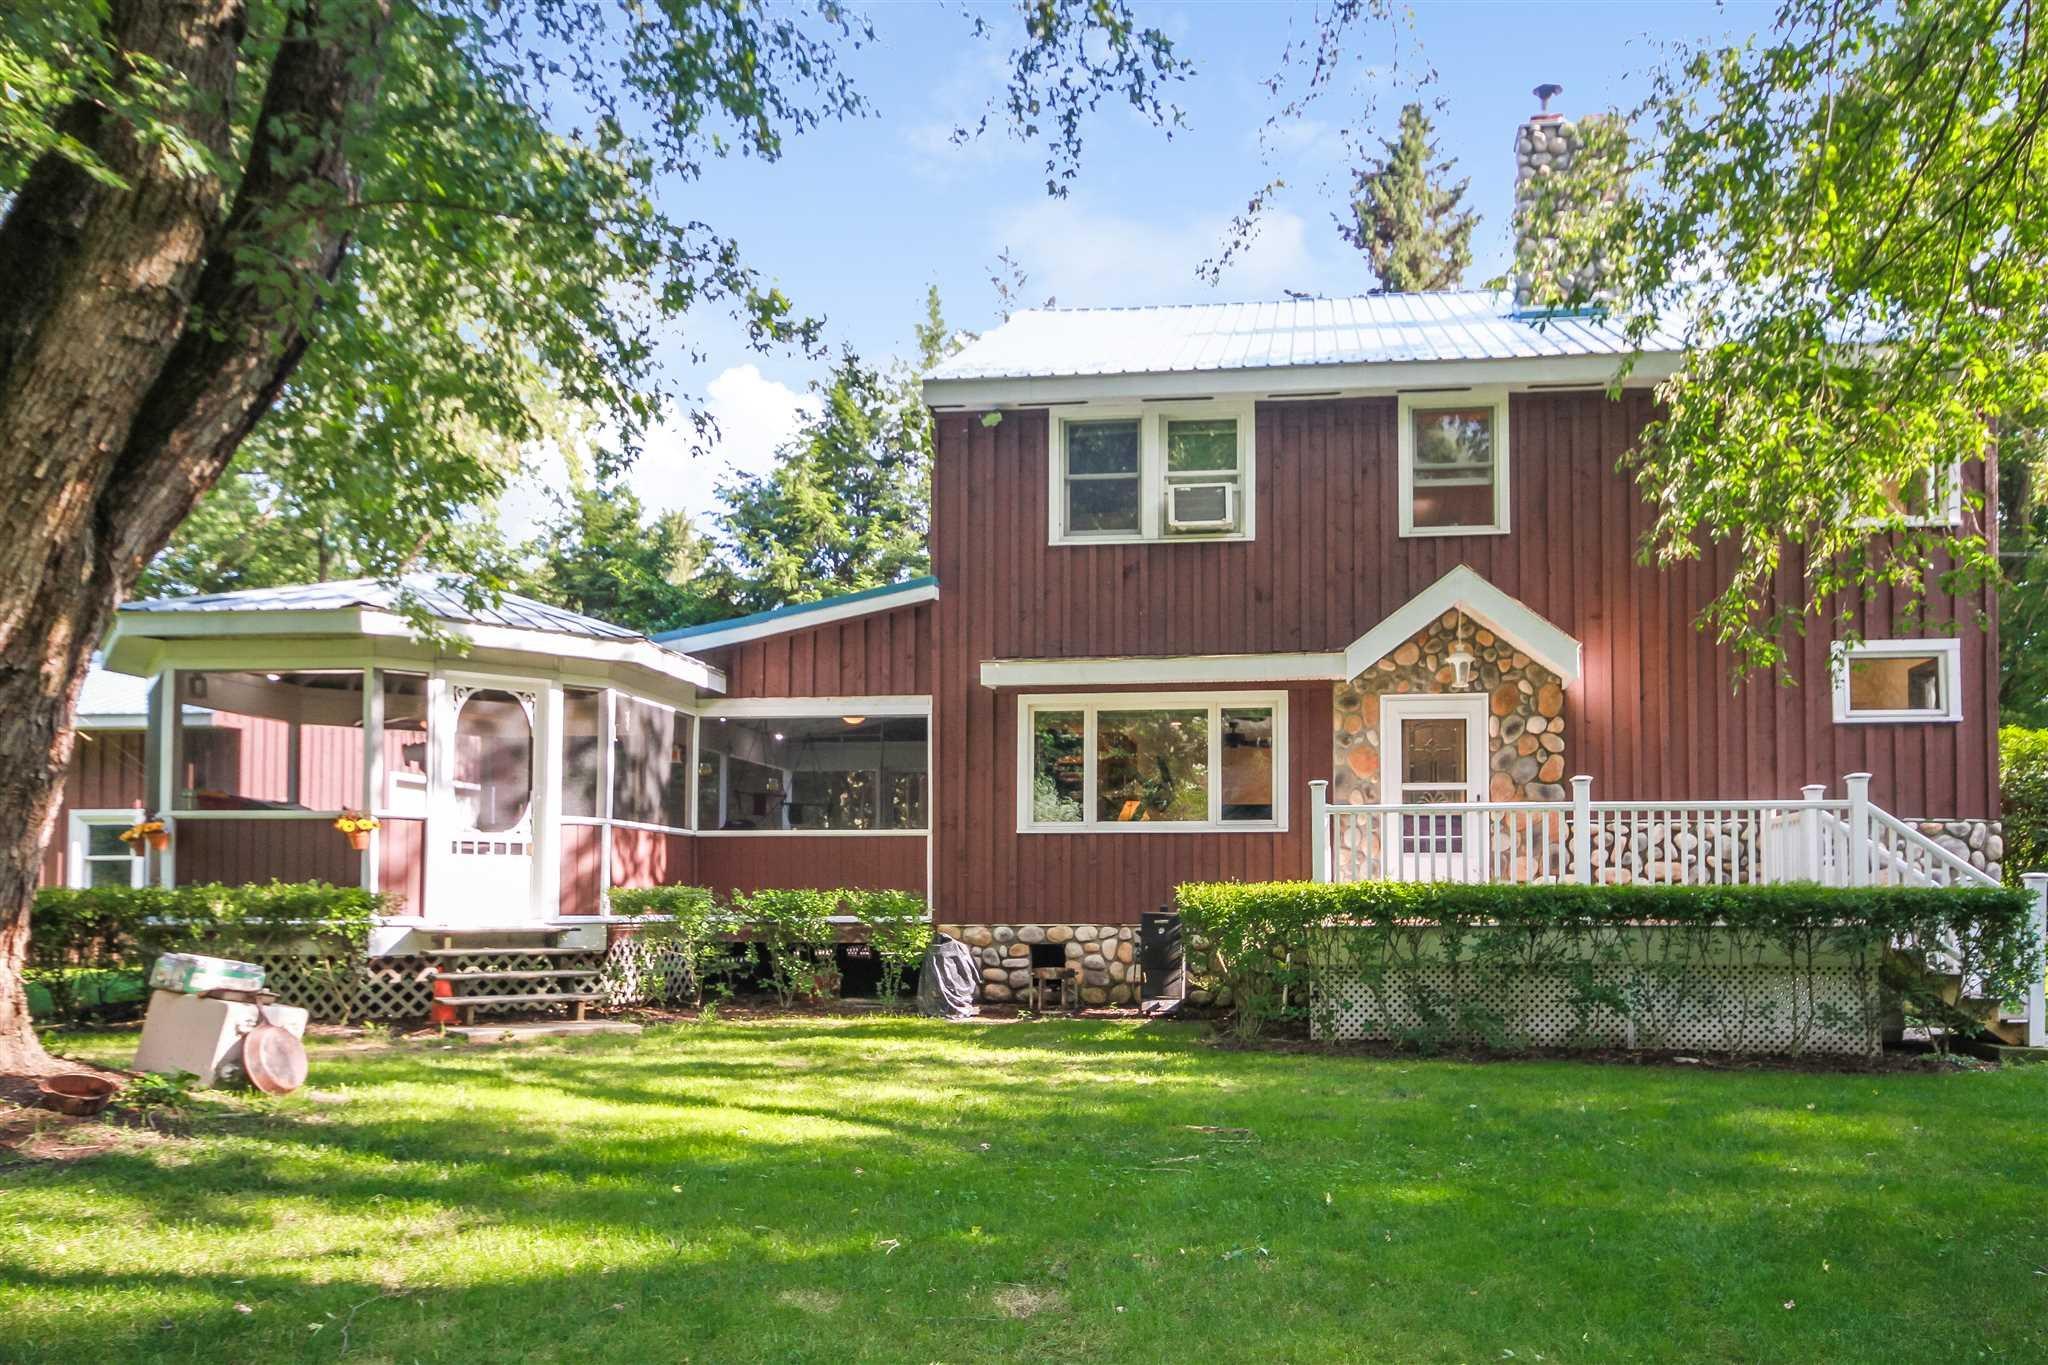 Single Family Home for Sale at 10 BREVI 10 BREVI Dover Plains, New York 12522 United States